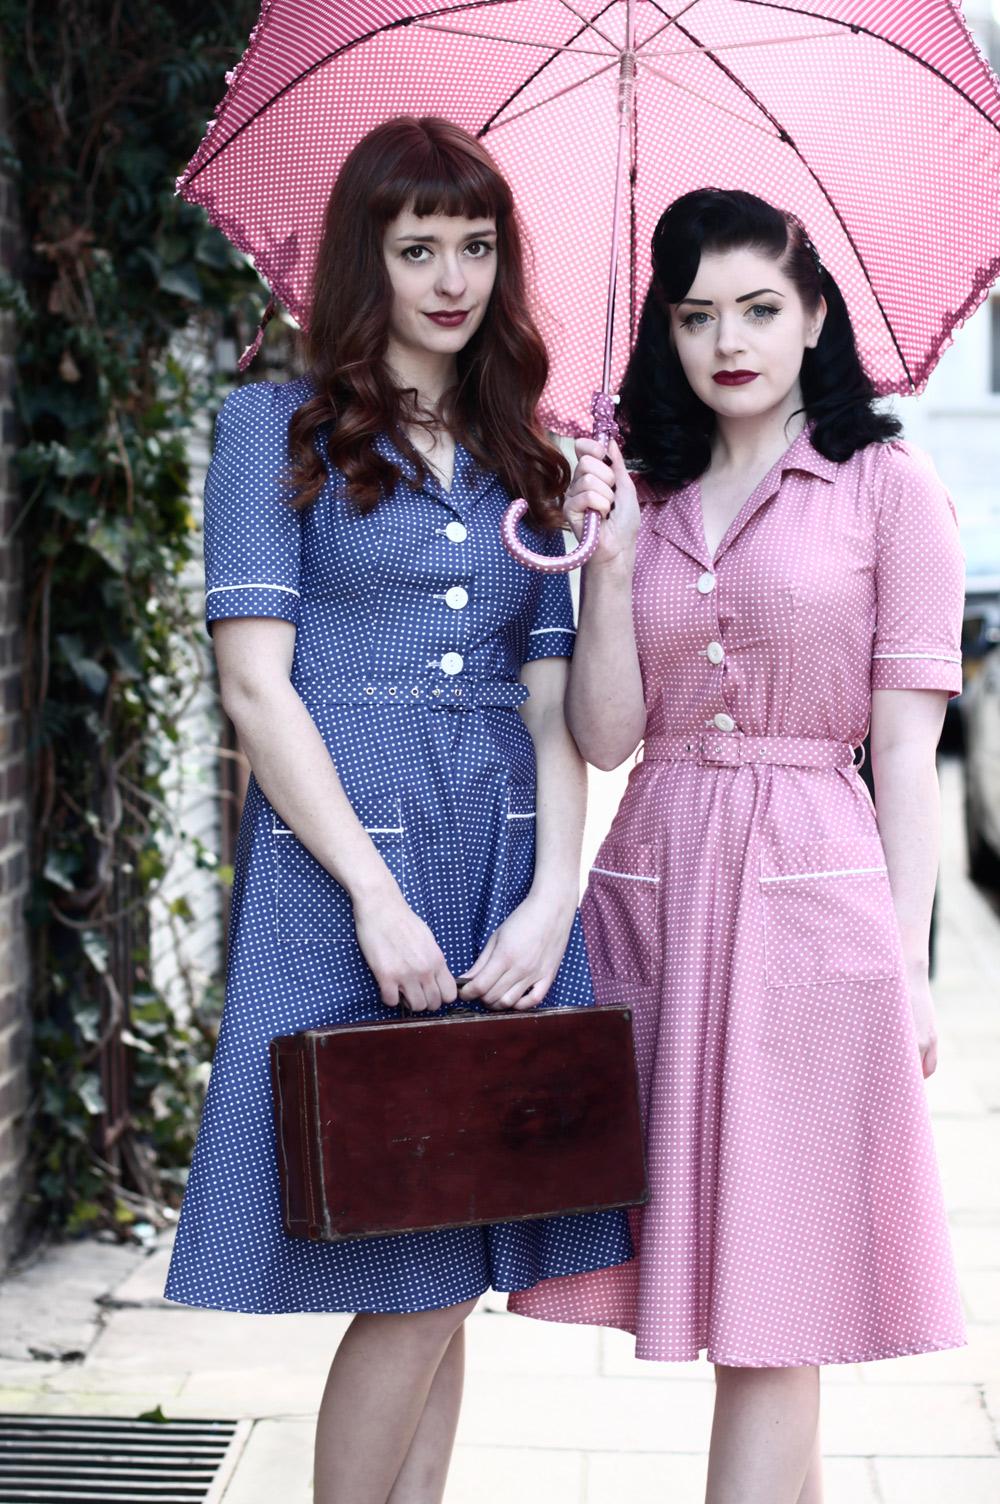 A 1940s style tea dress